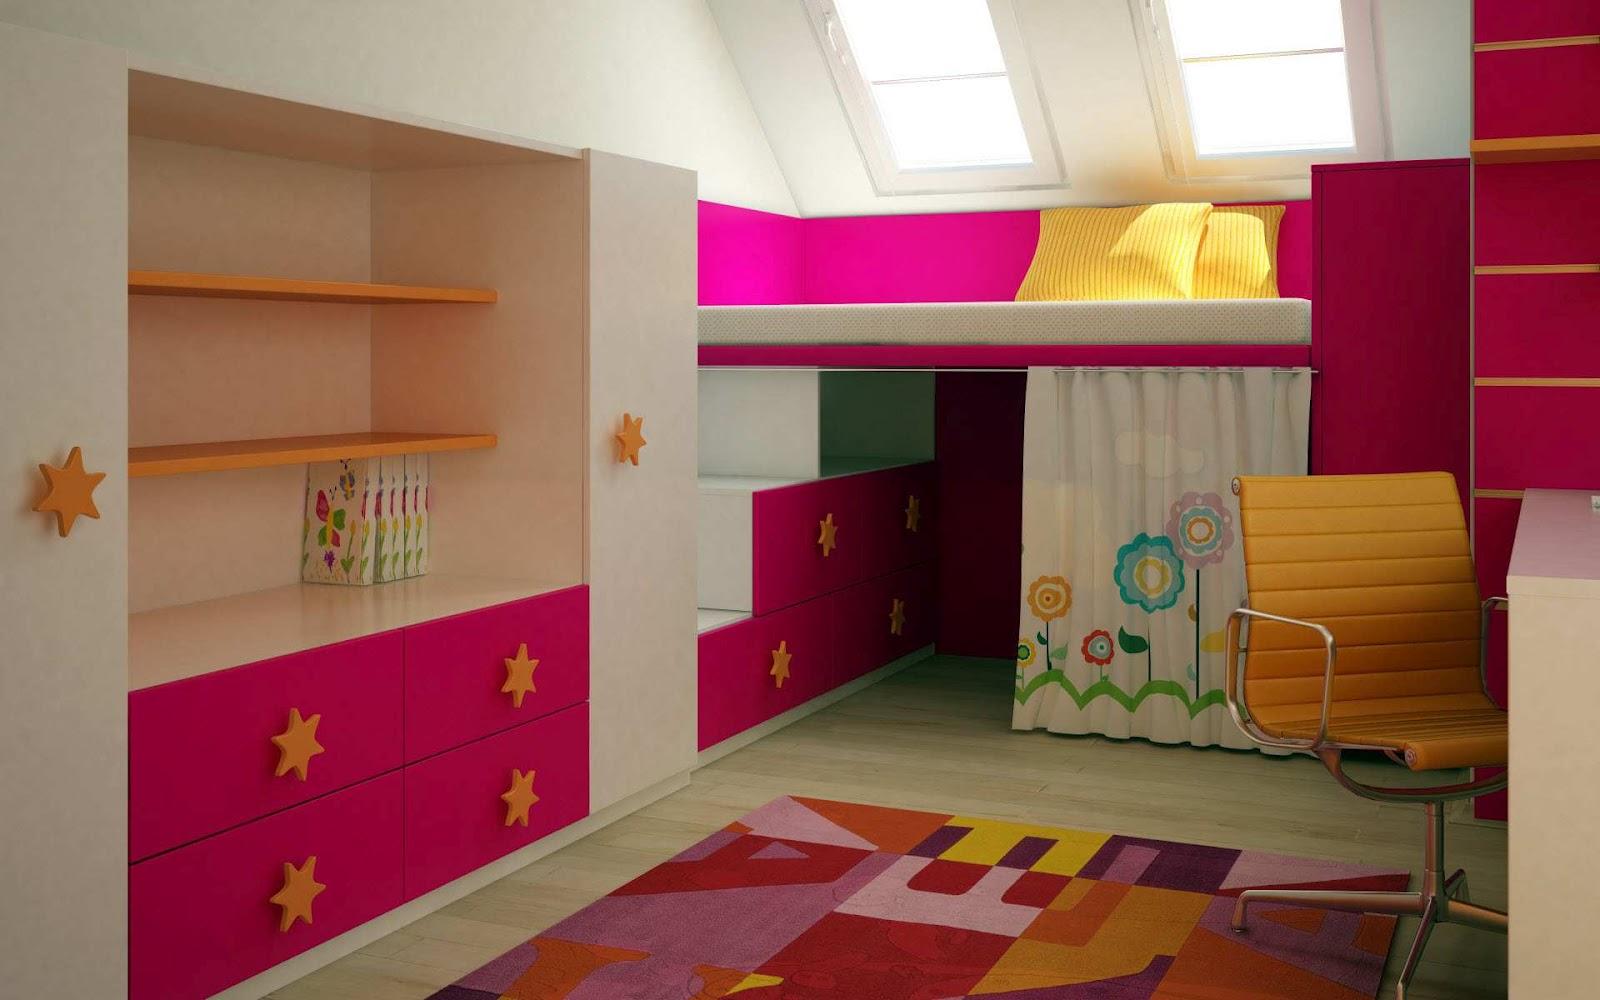 http://1.bp.blogspot.com/-6JEMOFevEWg/UFgqknc35yI/AAAAAAAABEI/pba459VAF6o/s1600/Beautiful+Pink+Kids+Room+Interior+Design.jpg